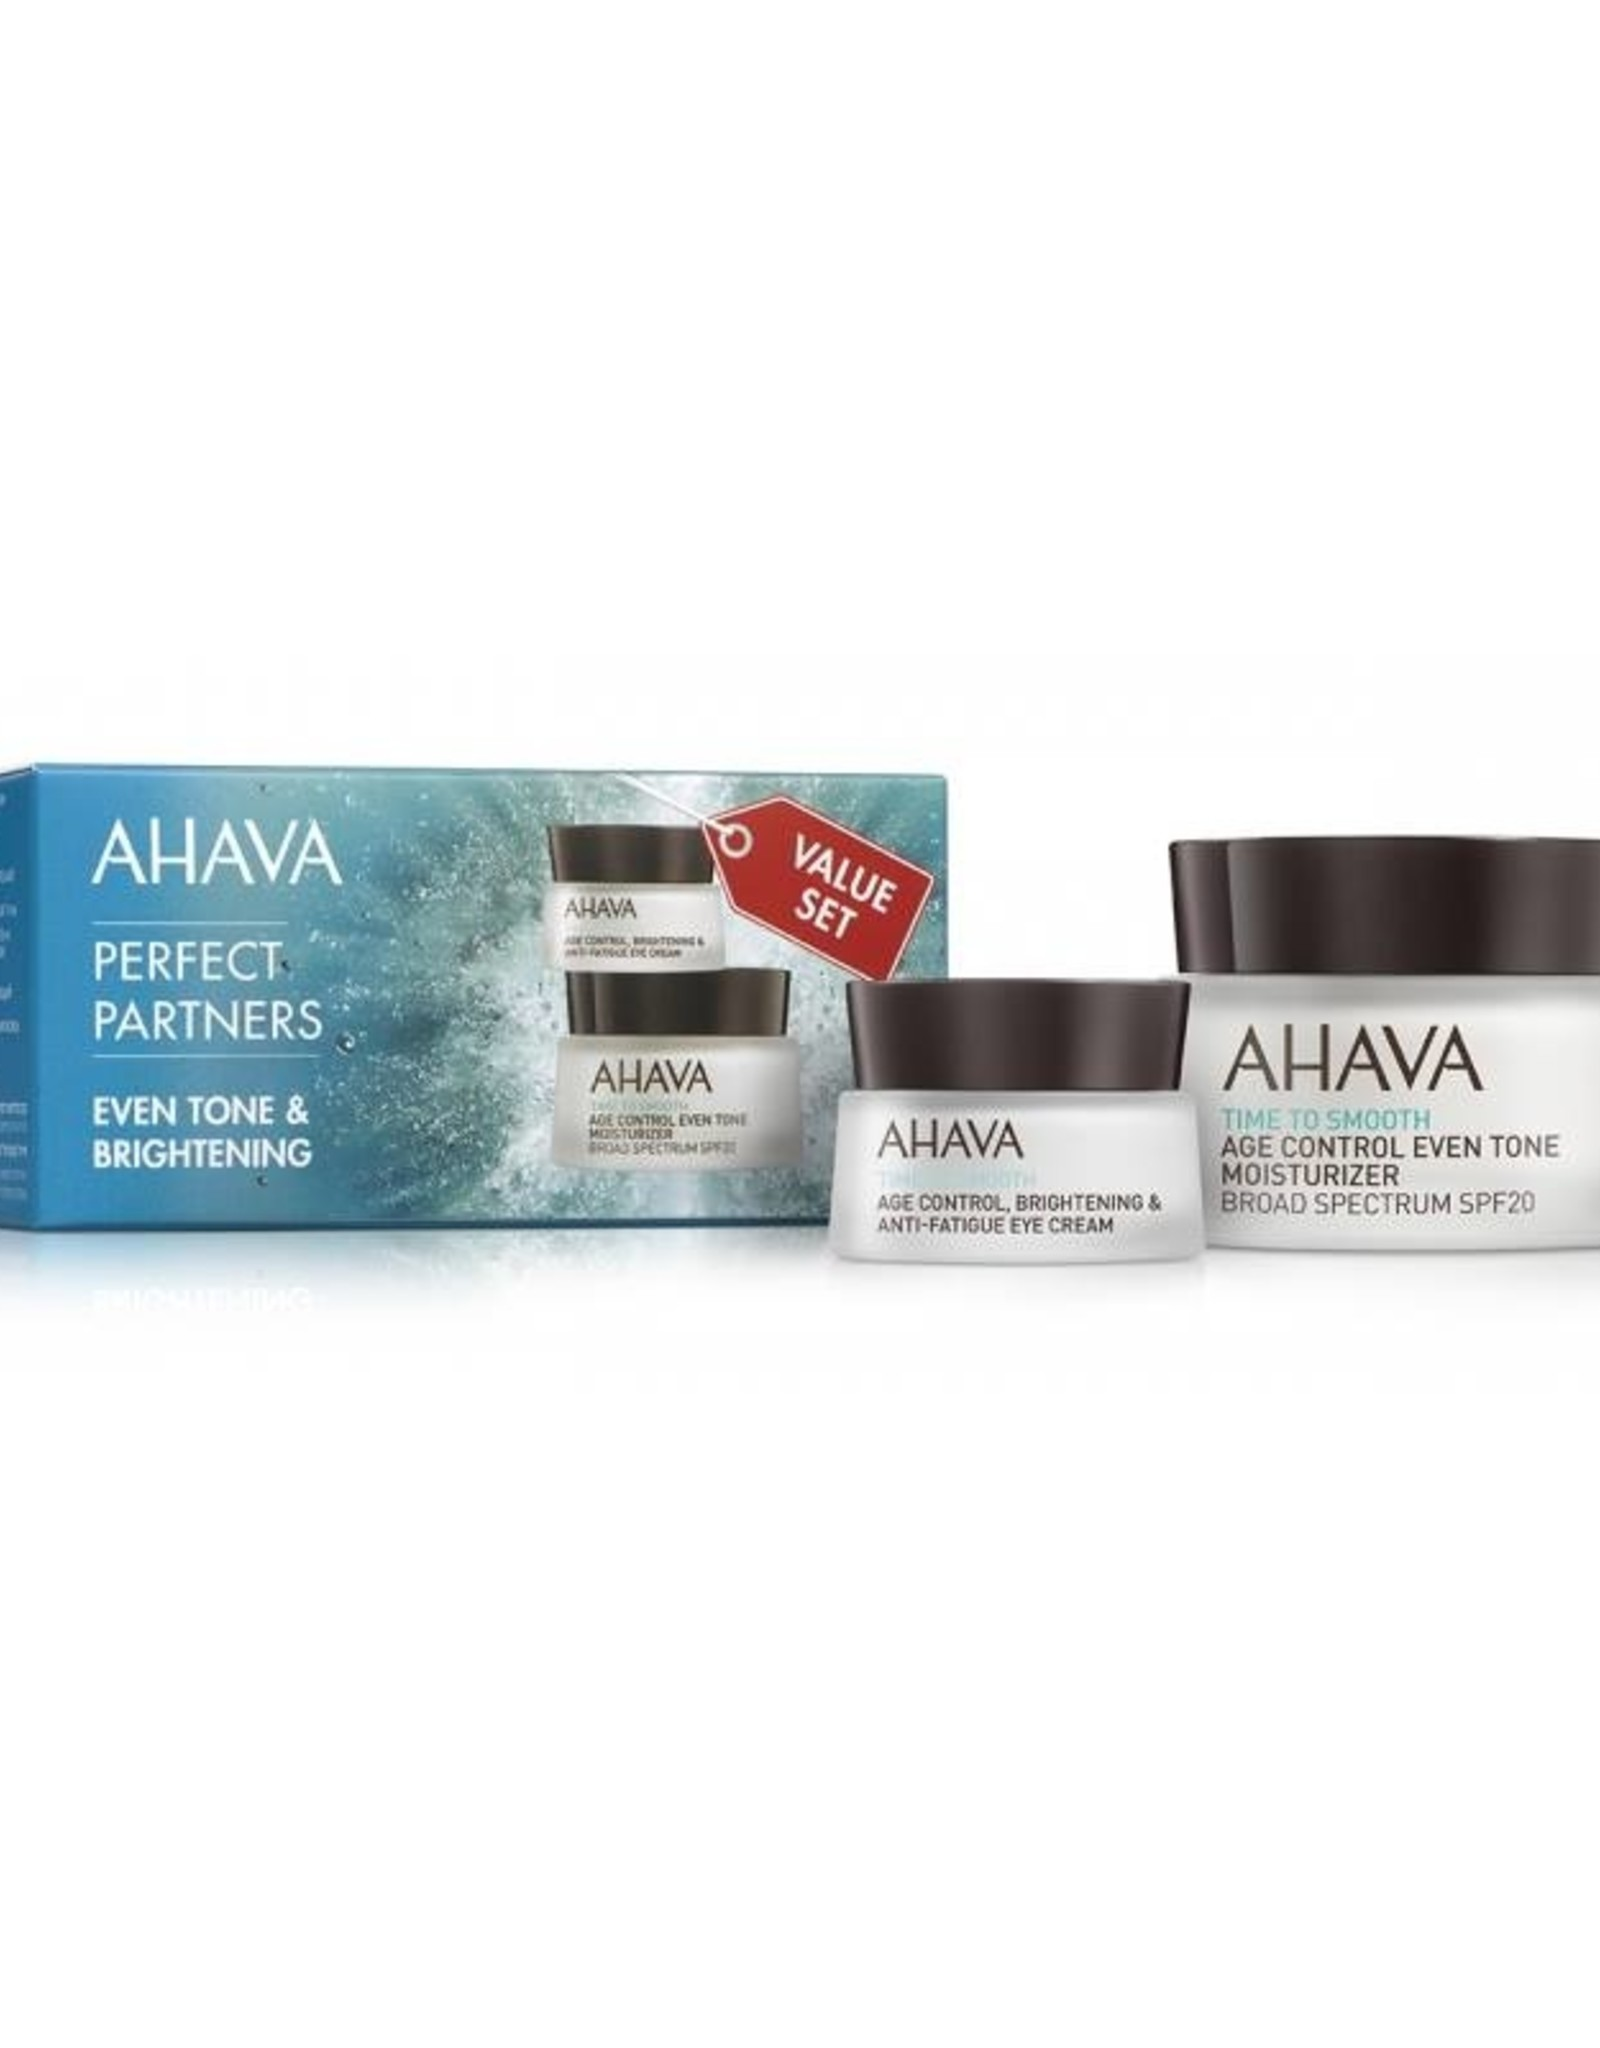 AHAVA Perfect partners even tone spf 20  50ml &brightening eye cream 15ml